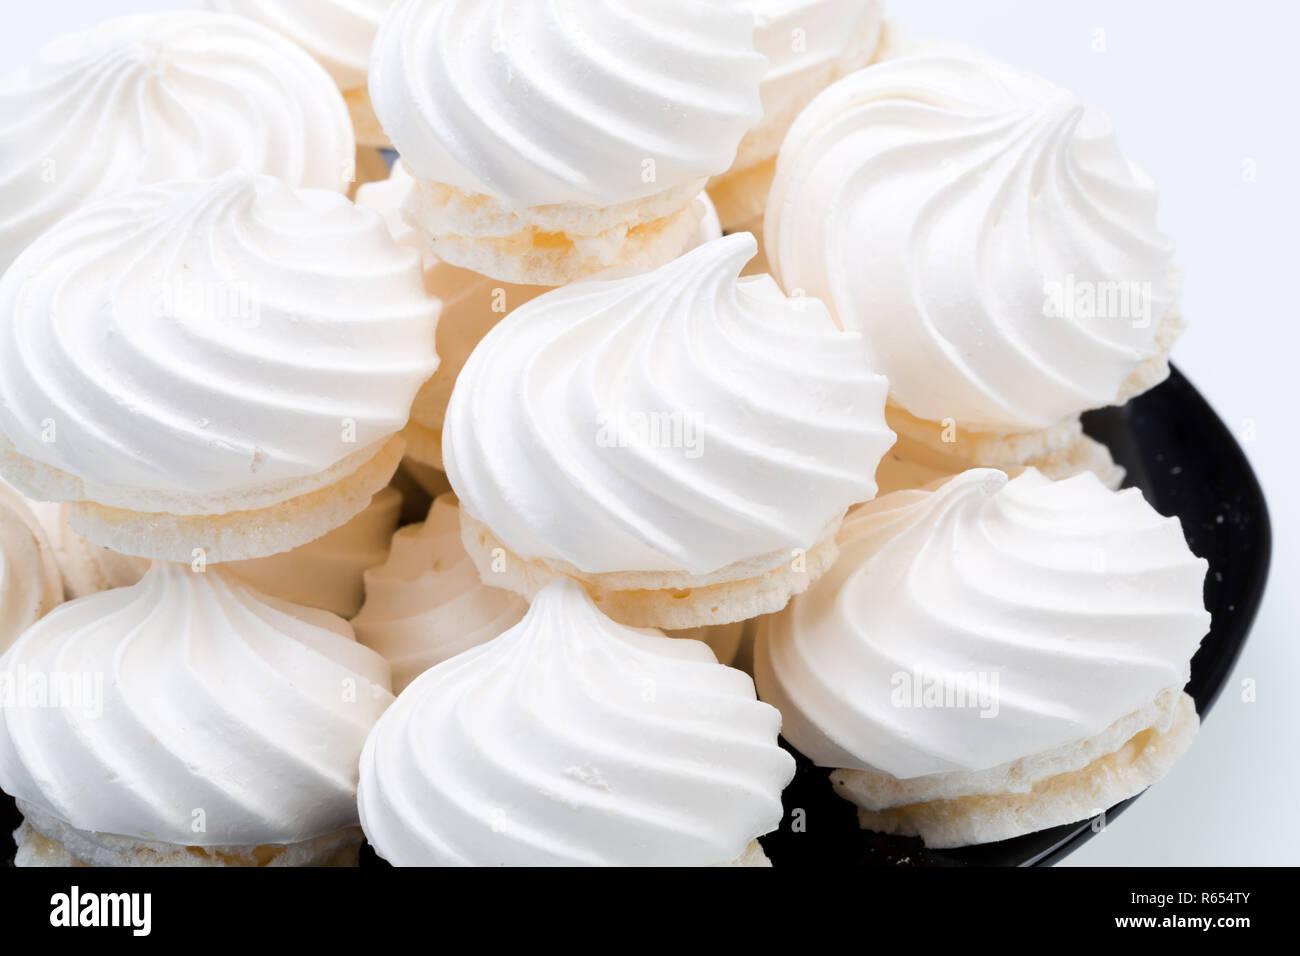 French vanilla meringue cookies - Stock Image